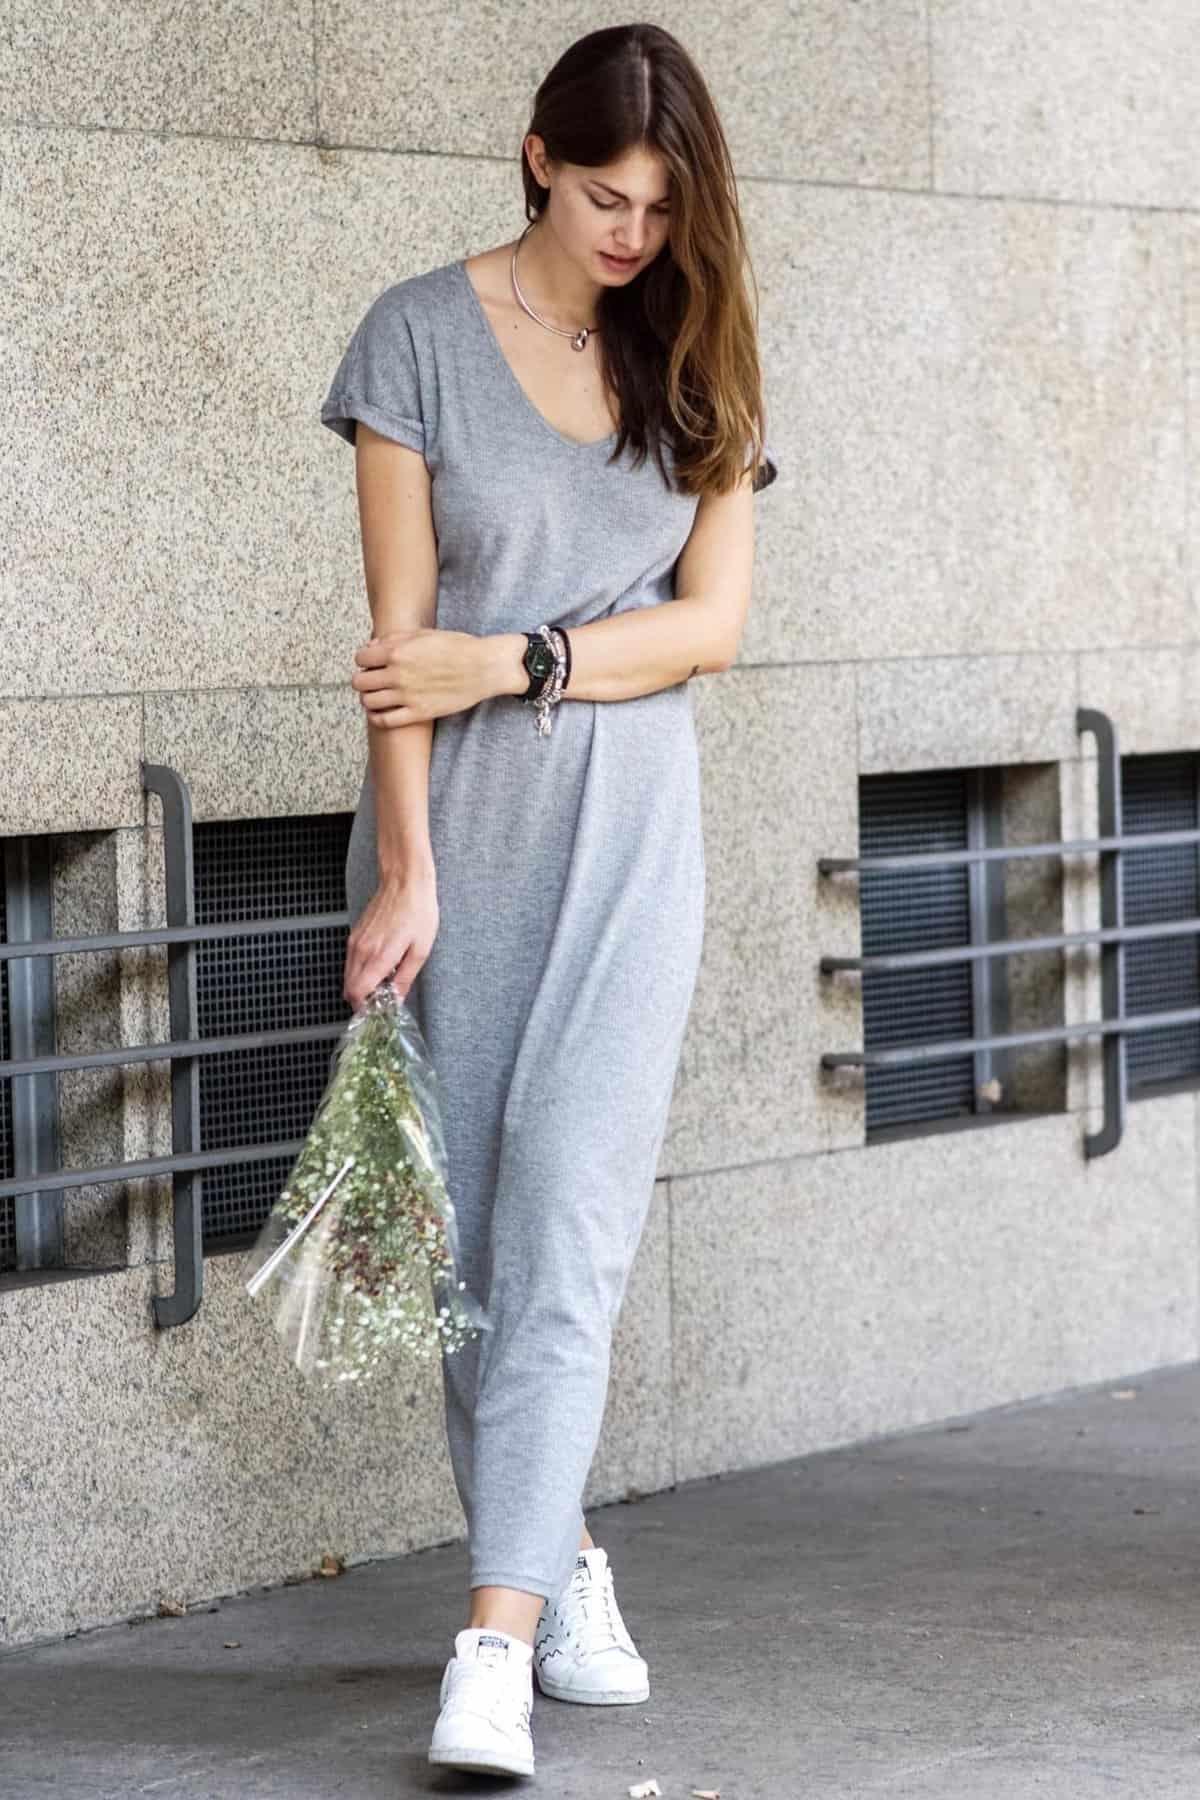 Grey_Dress_White_Sneakers-4